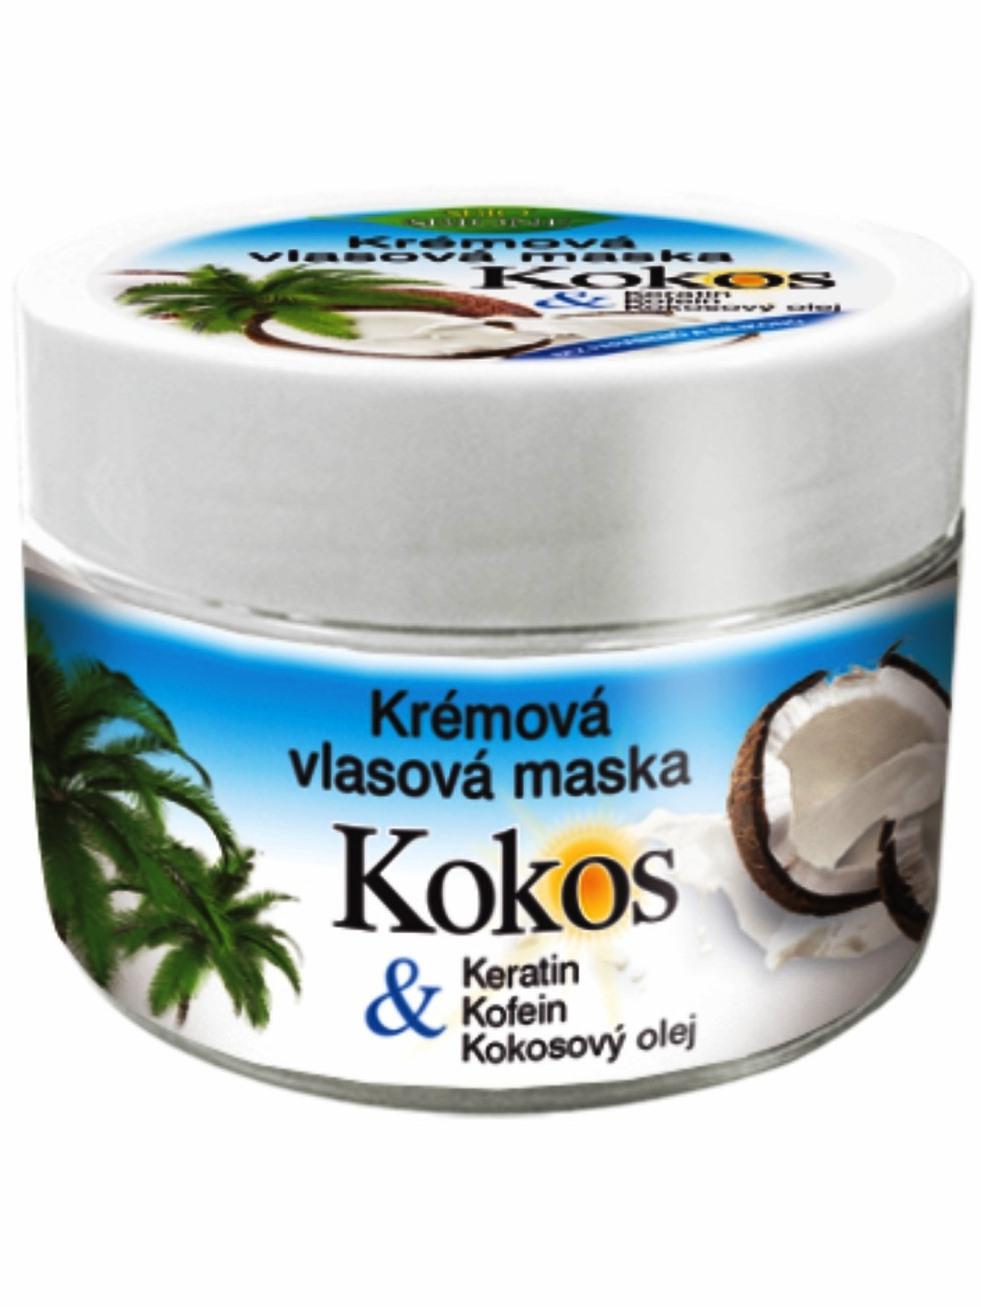 Bione Cosmetics - Krémová vlasová maska Kokos 260ml